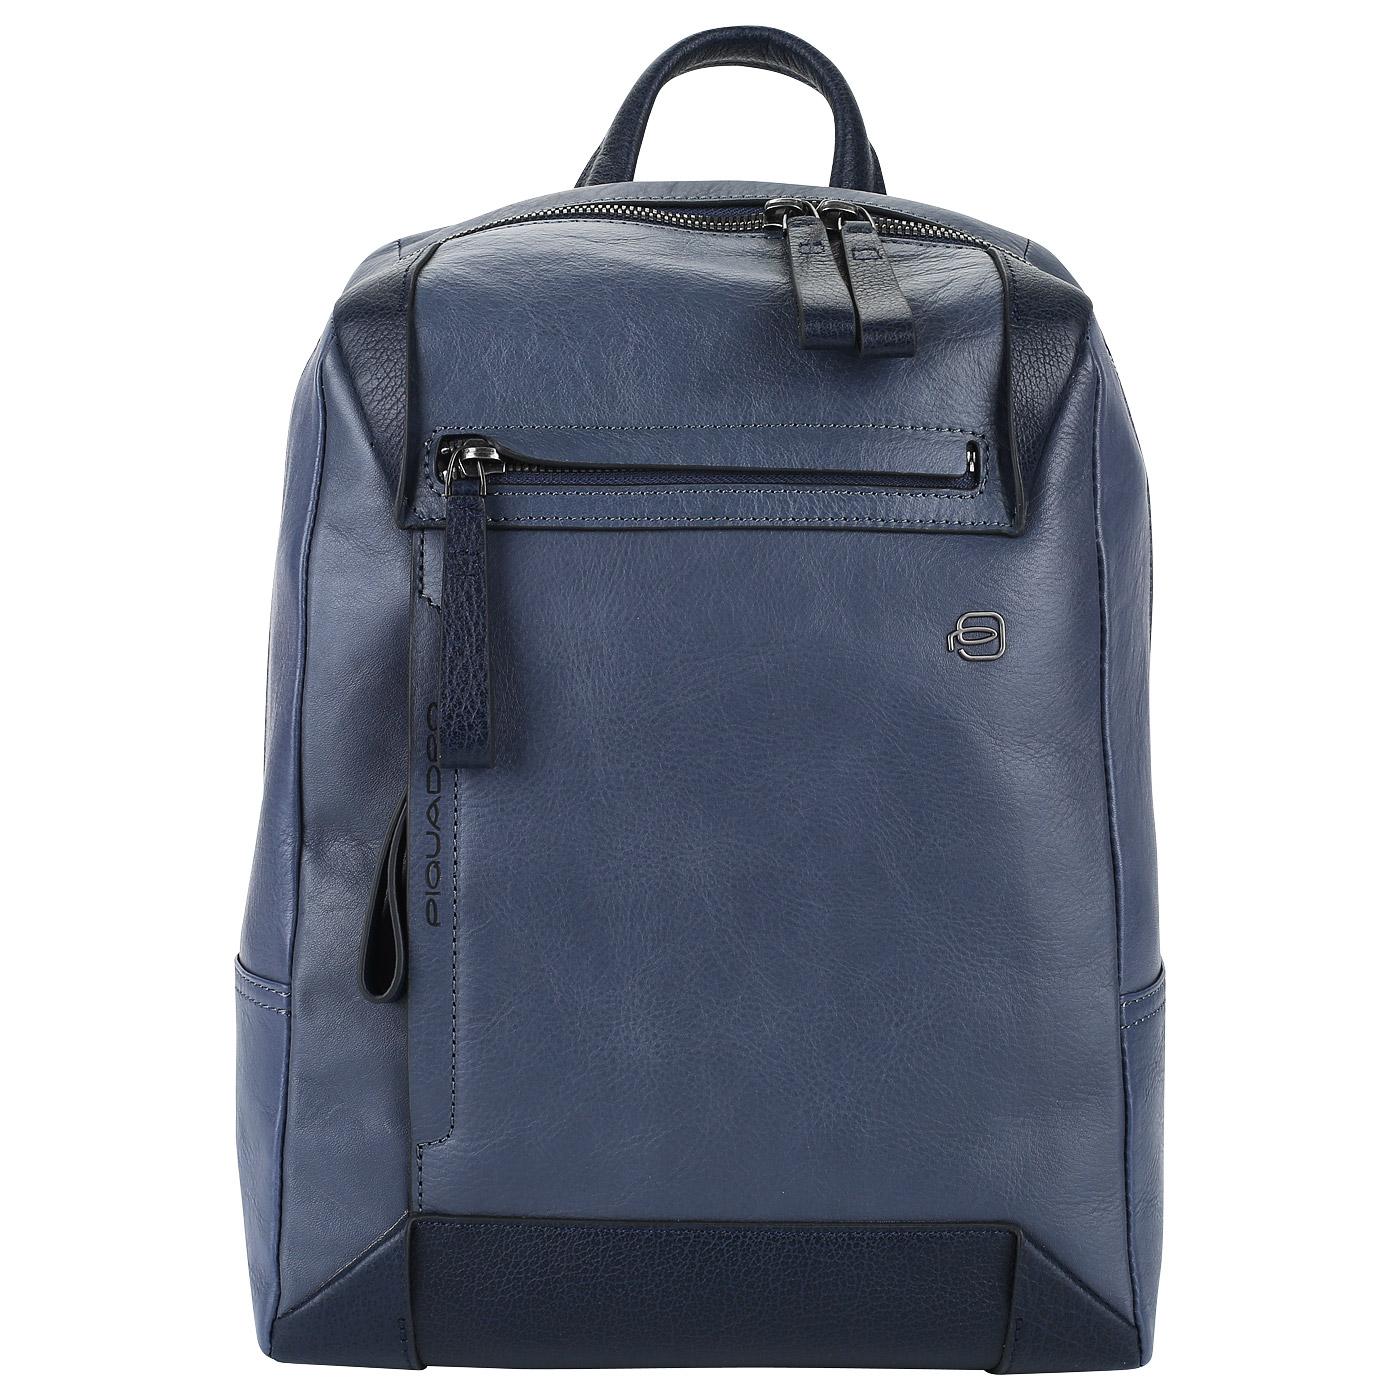 91e4a2f64ce8 Деловой рюкзак из натуральной кожи Piquadro Pan BD4300S94/AV ...